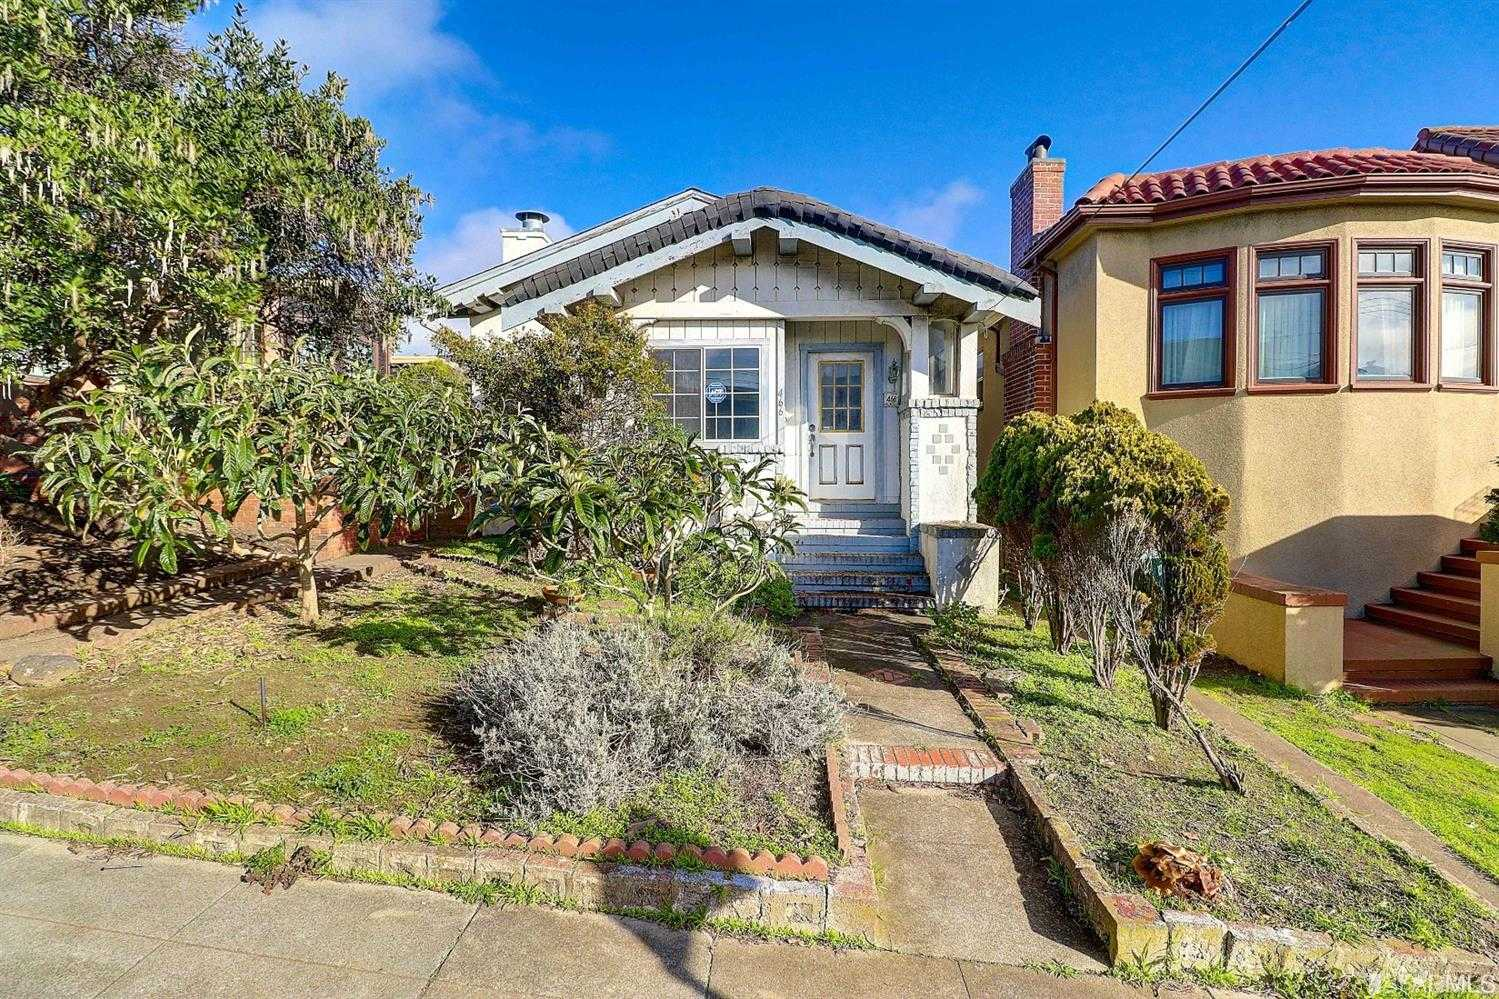 $1,299,000 - 2Br/1Ba -  for Sale in San Francisco